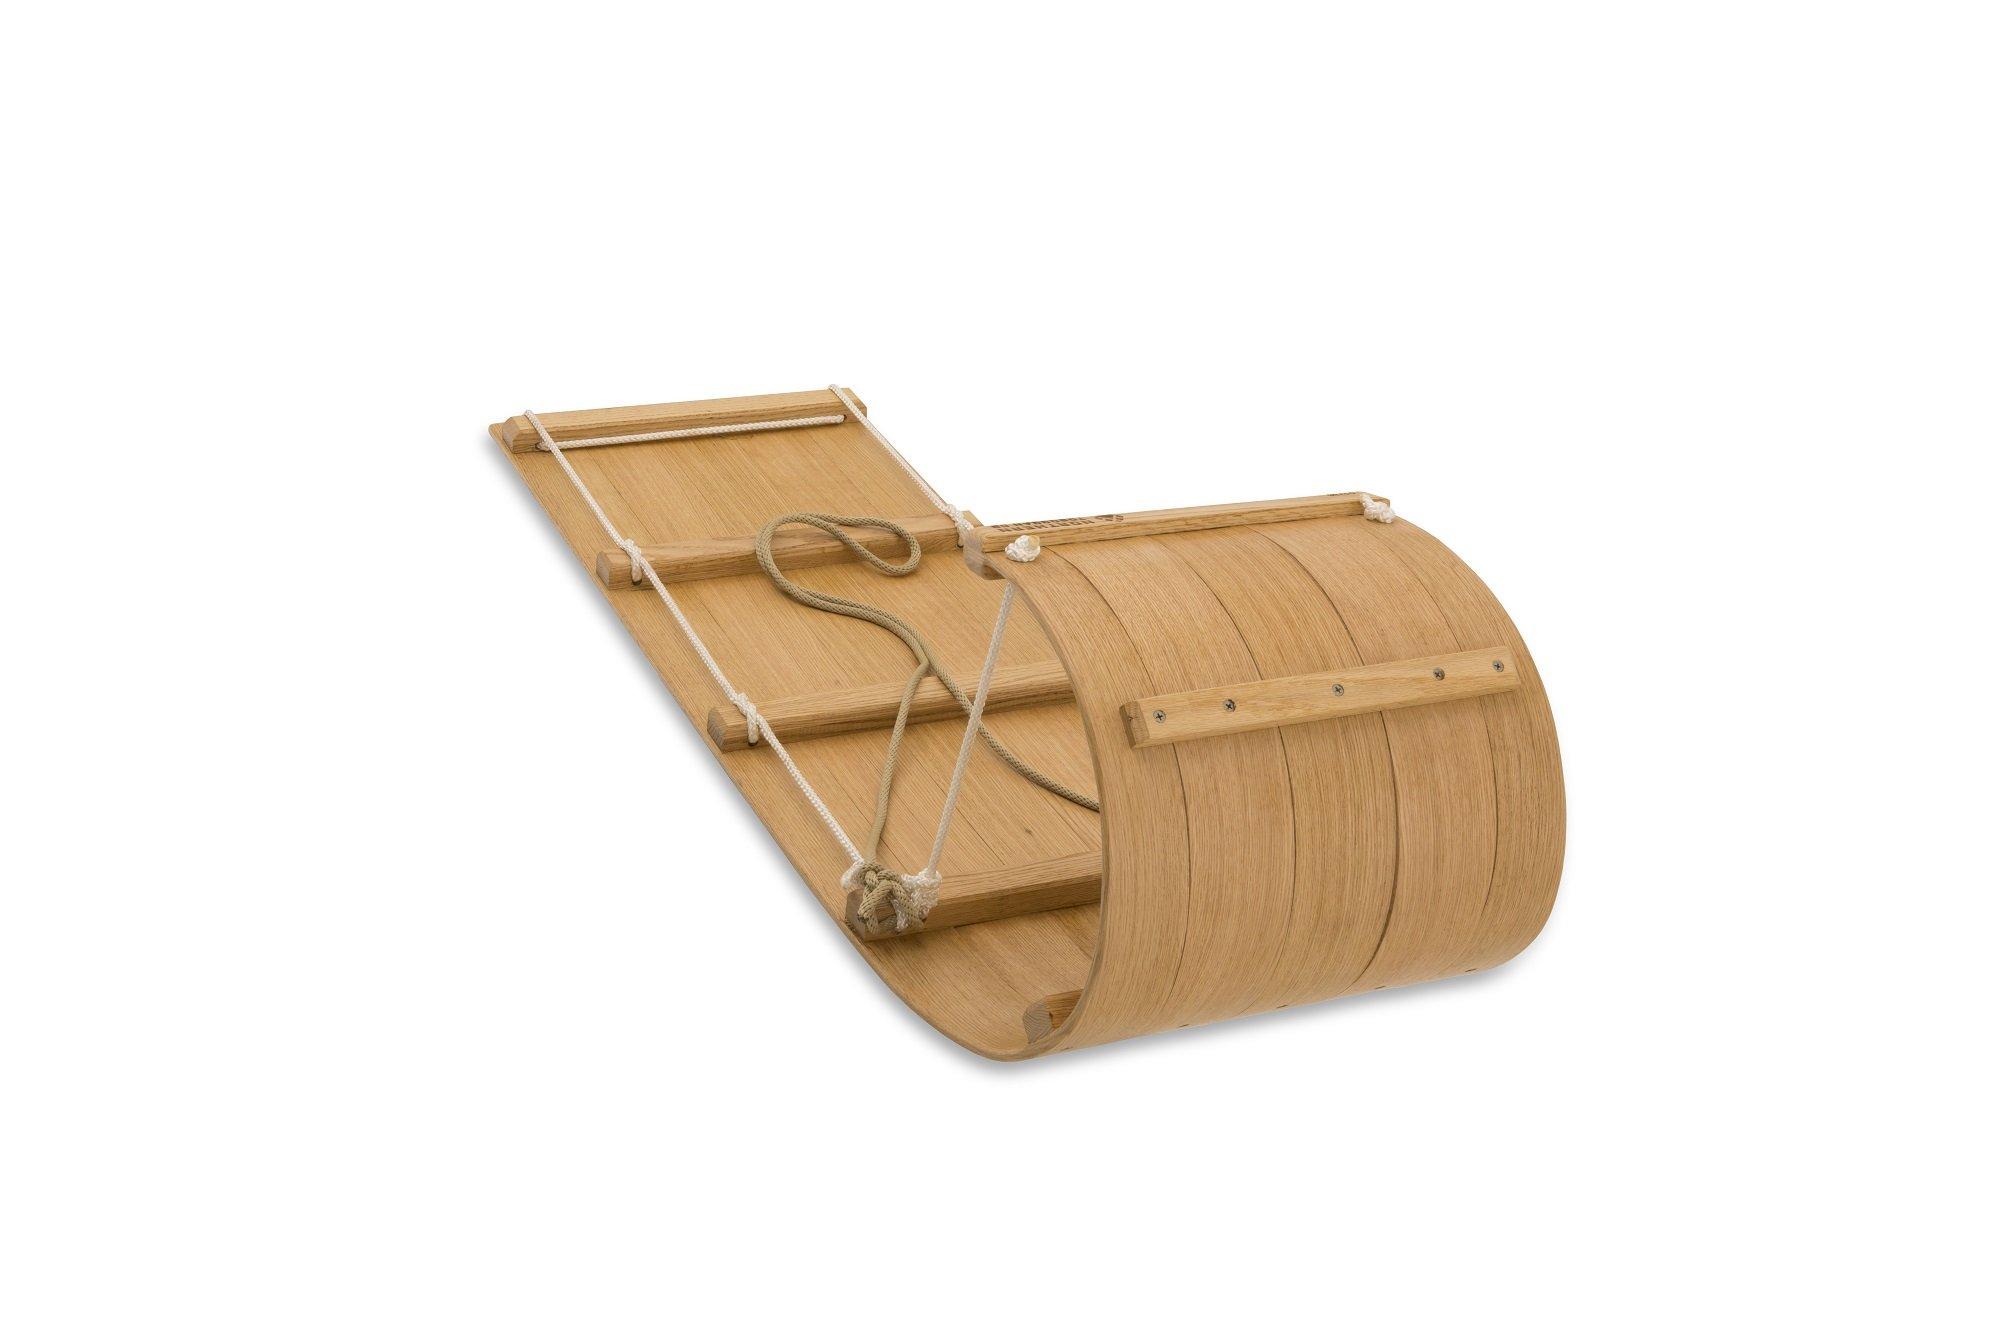 Little Classic Wood Toboggan - 4 foot Downhill Toboggan